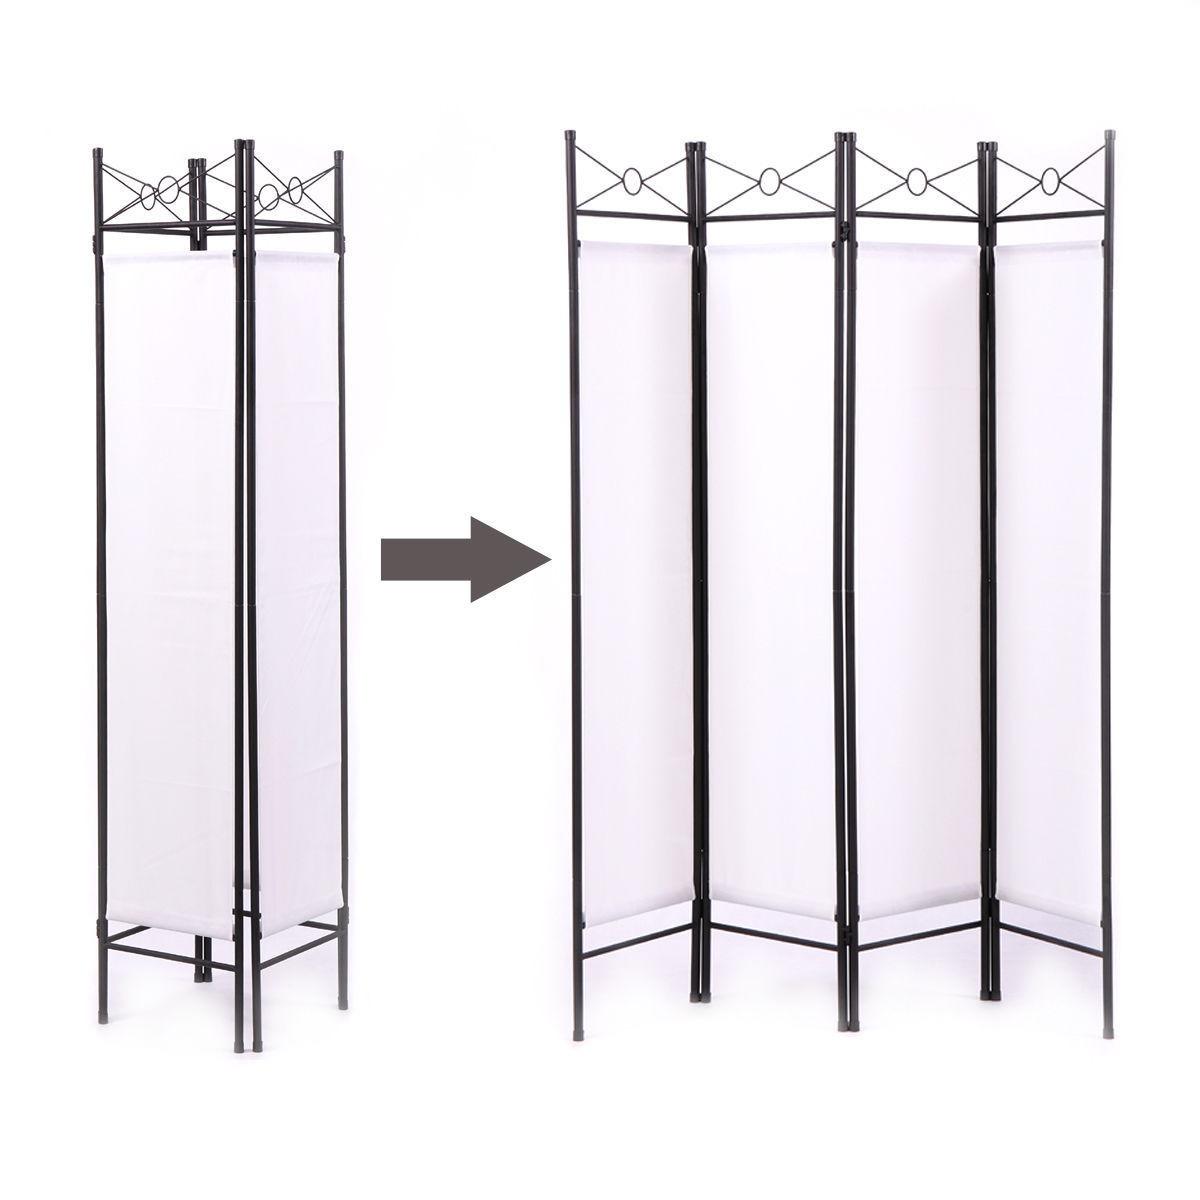 Blanco 4 Panel Sala Divisor Privacidad Pantalla Inicio... - $ 62.990 ...